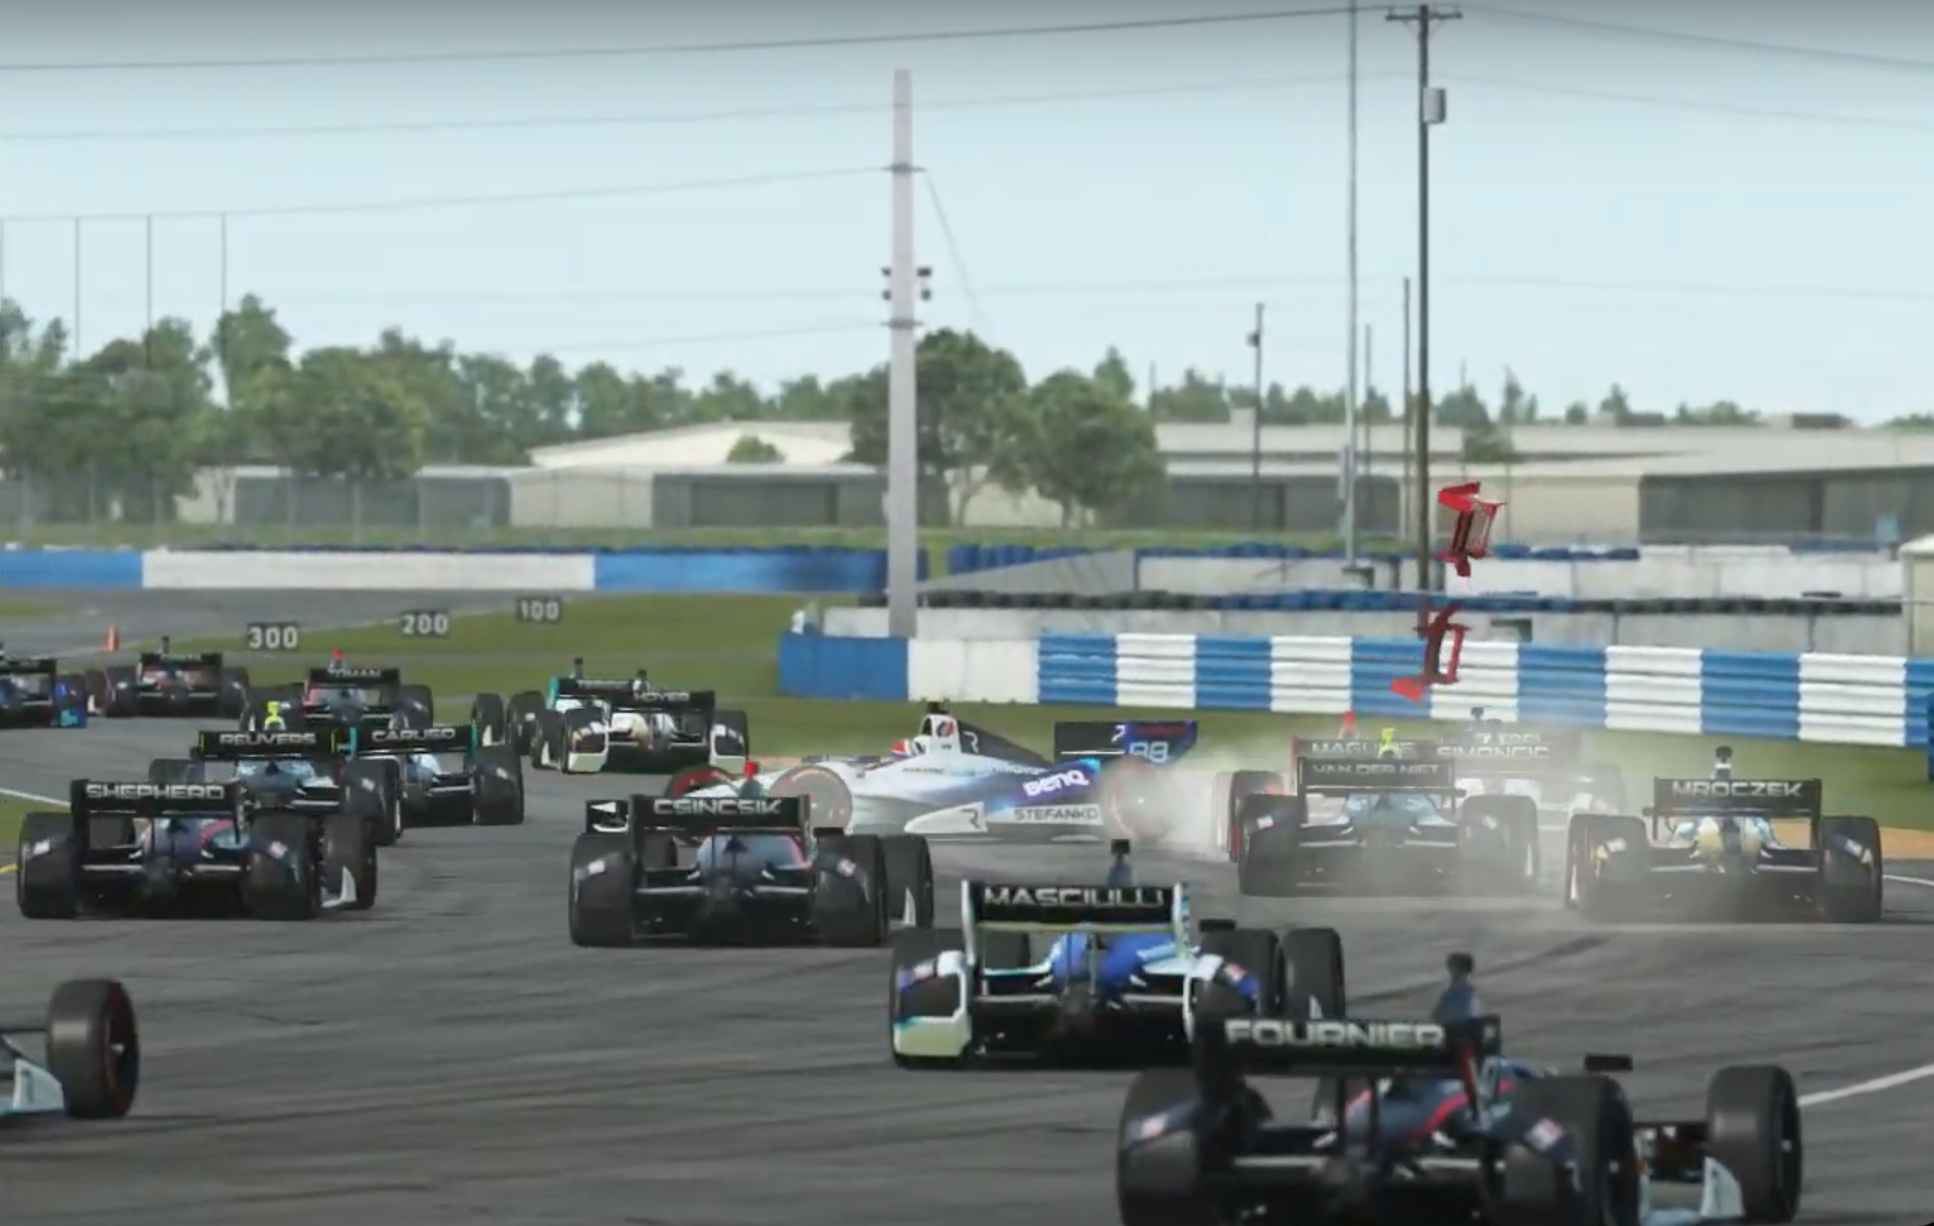 Indypro R3 Stefanko Crash